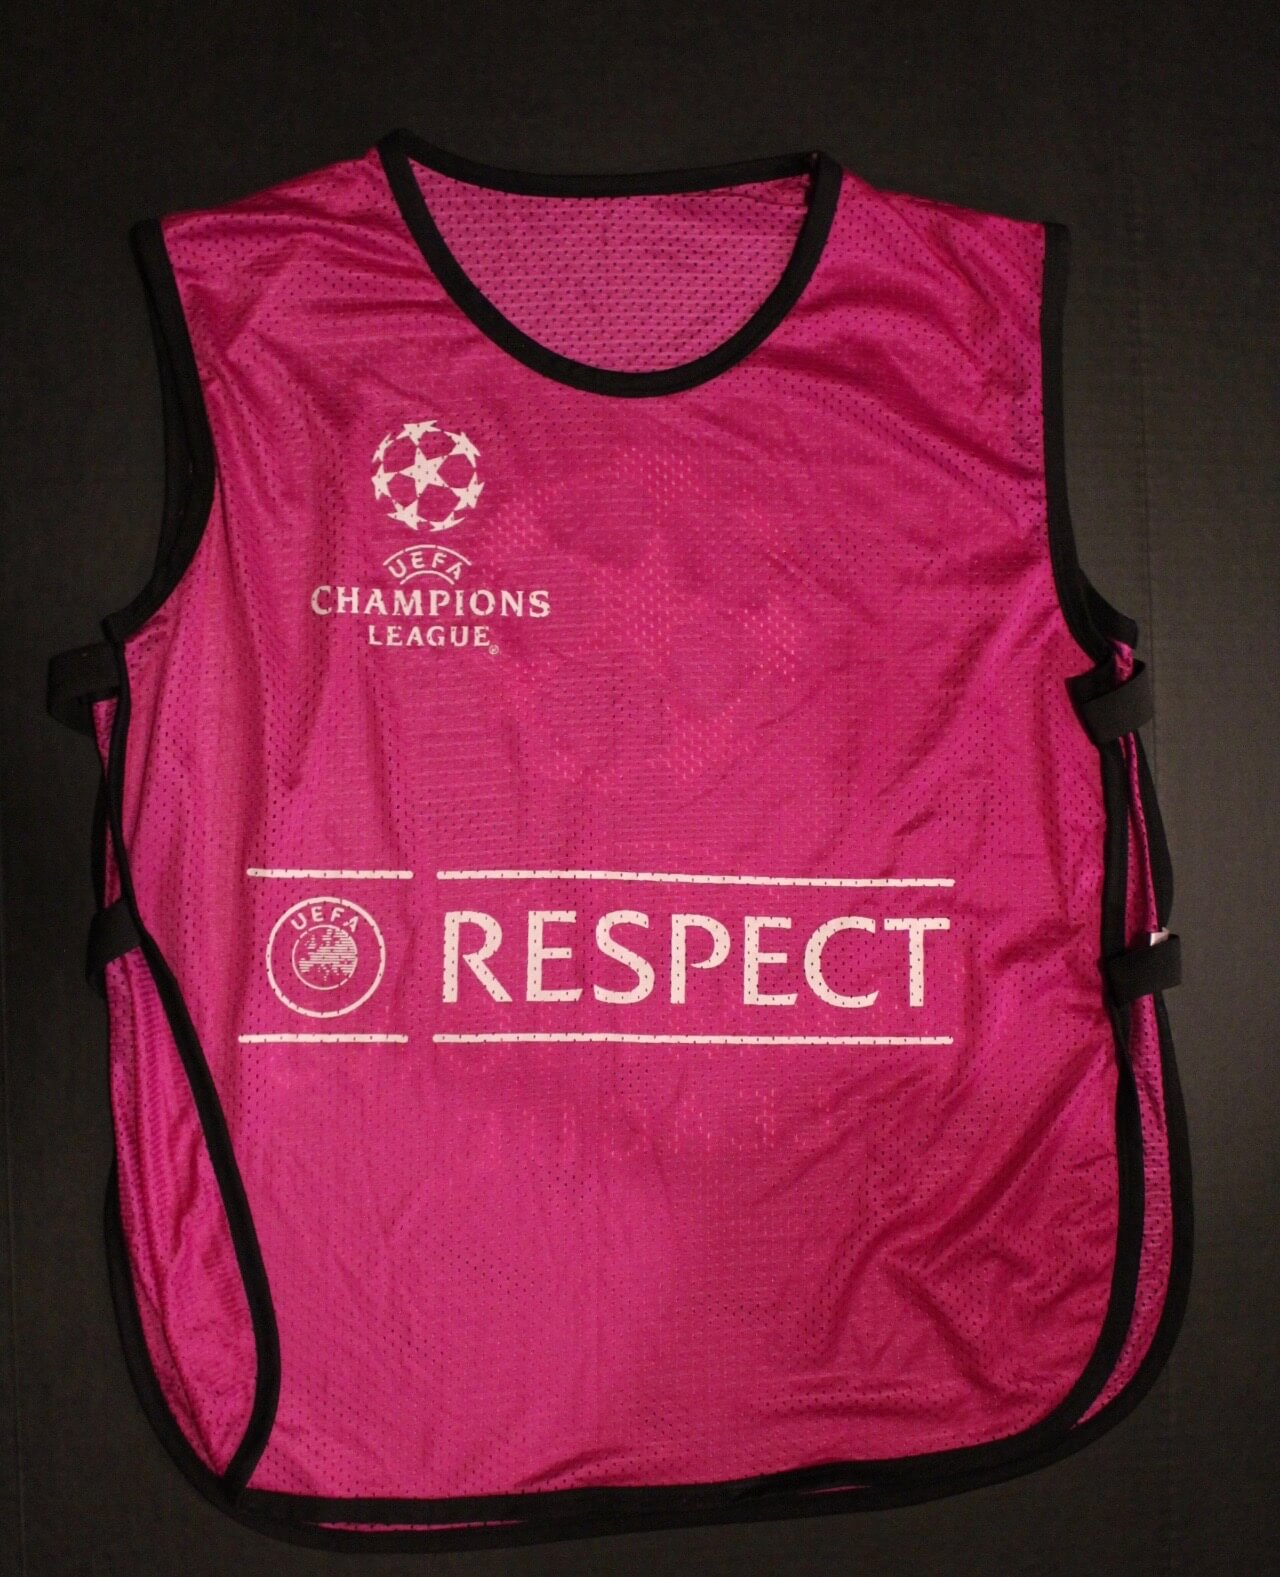 7f4c6f31880 FC Barcelona Game-Used UEFA Champions League Training Substitutes Bib.  2014 15 Season.